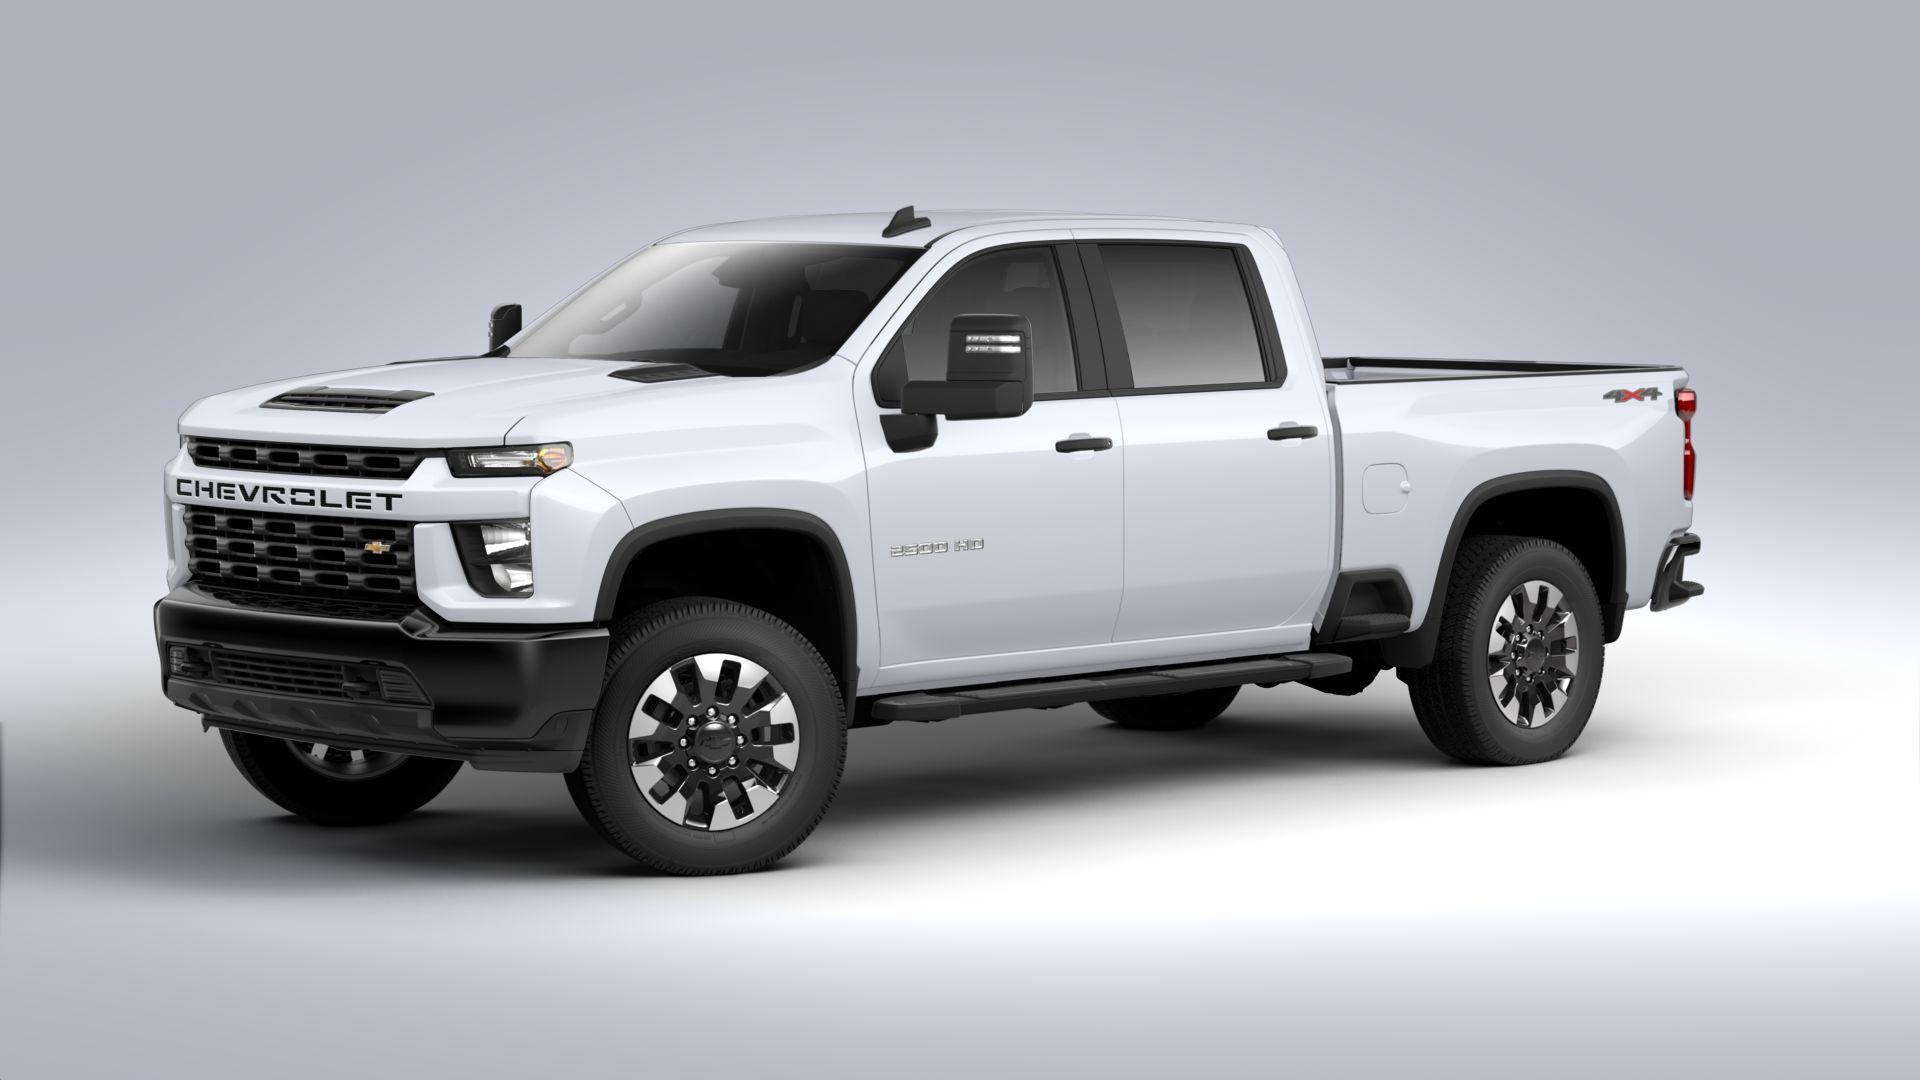 2020 Chevrolet Silverado 2500 HD Custom Truck